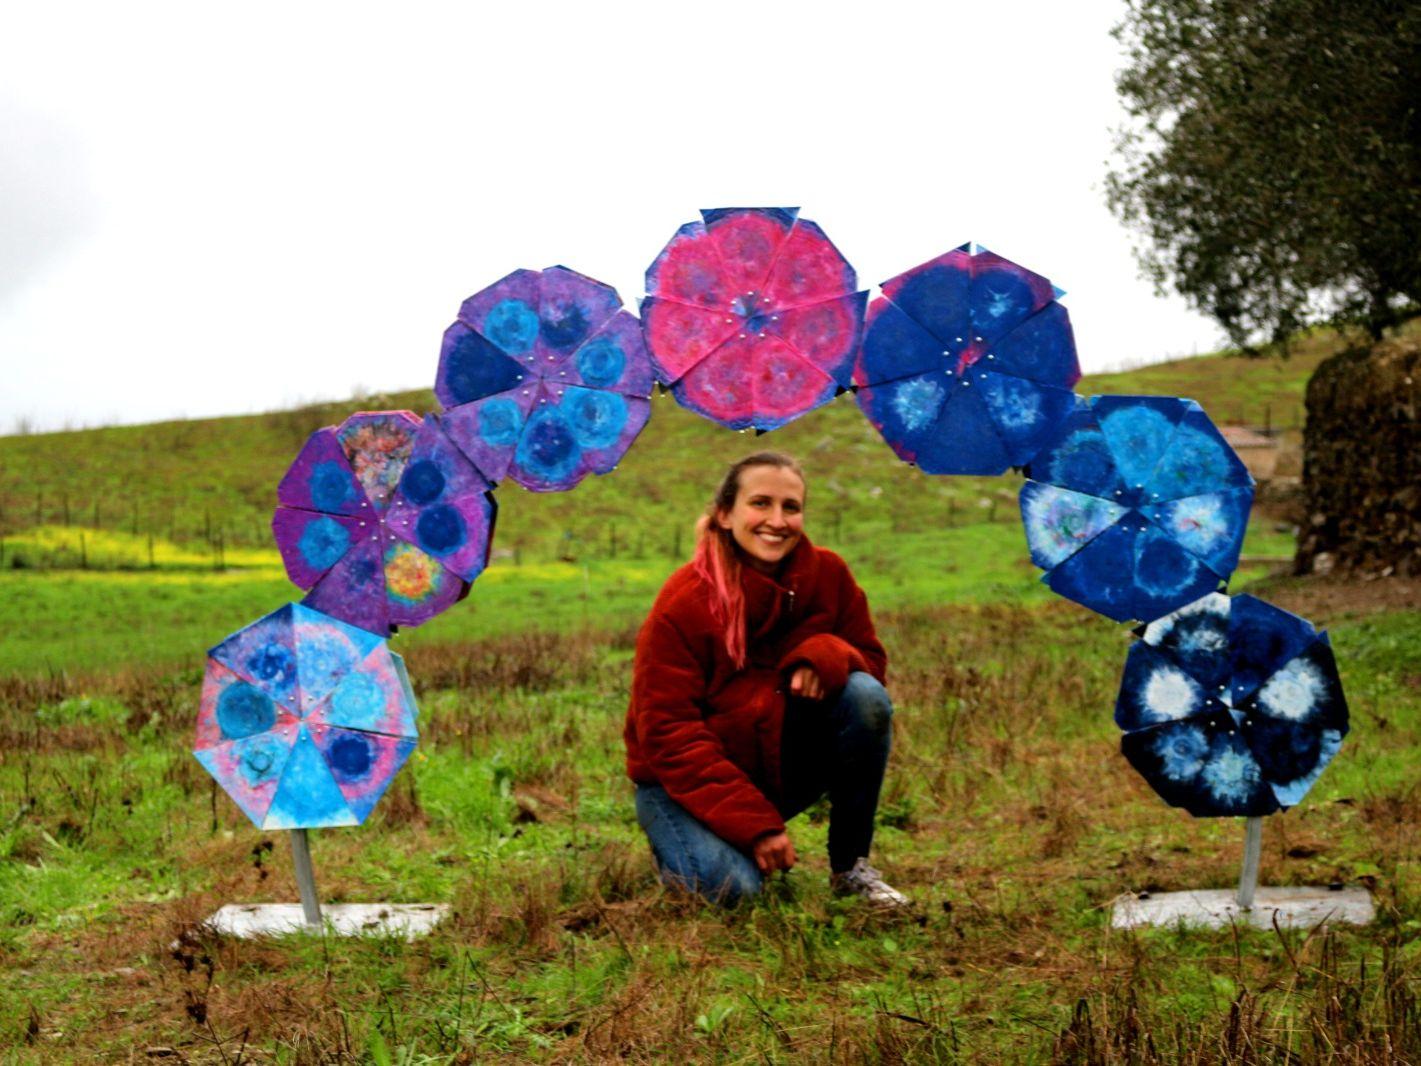 woman squatting in a field under a plastic sculpture